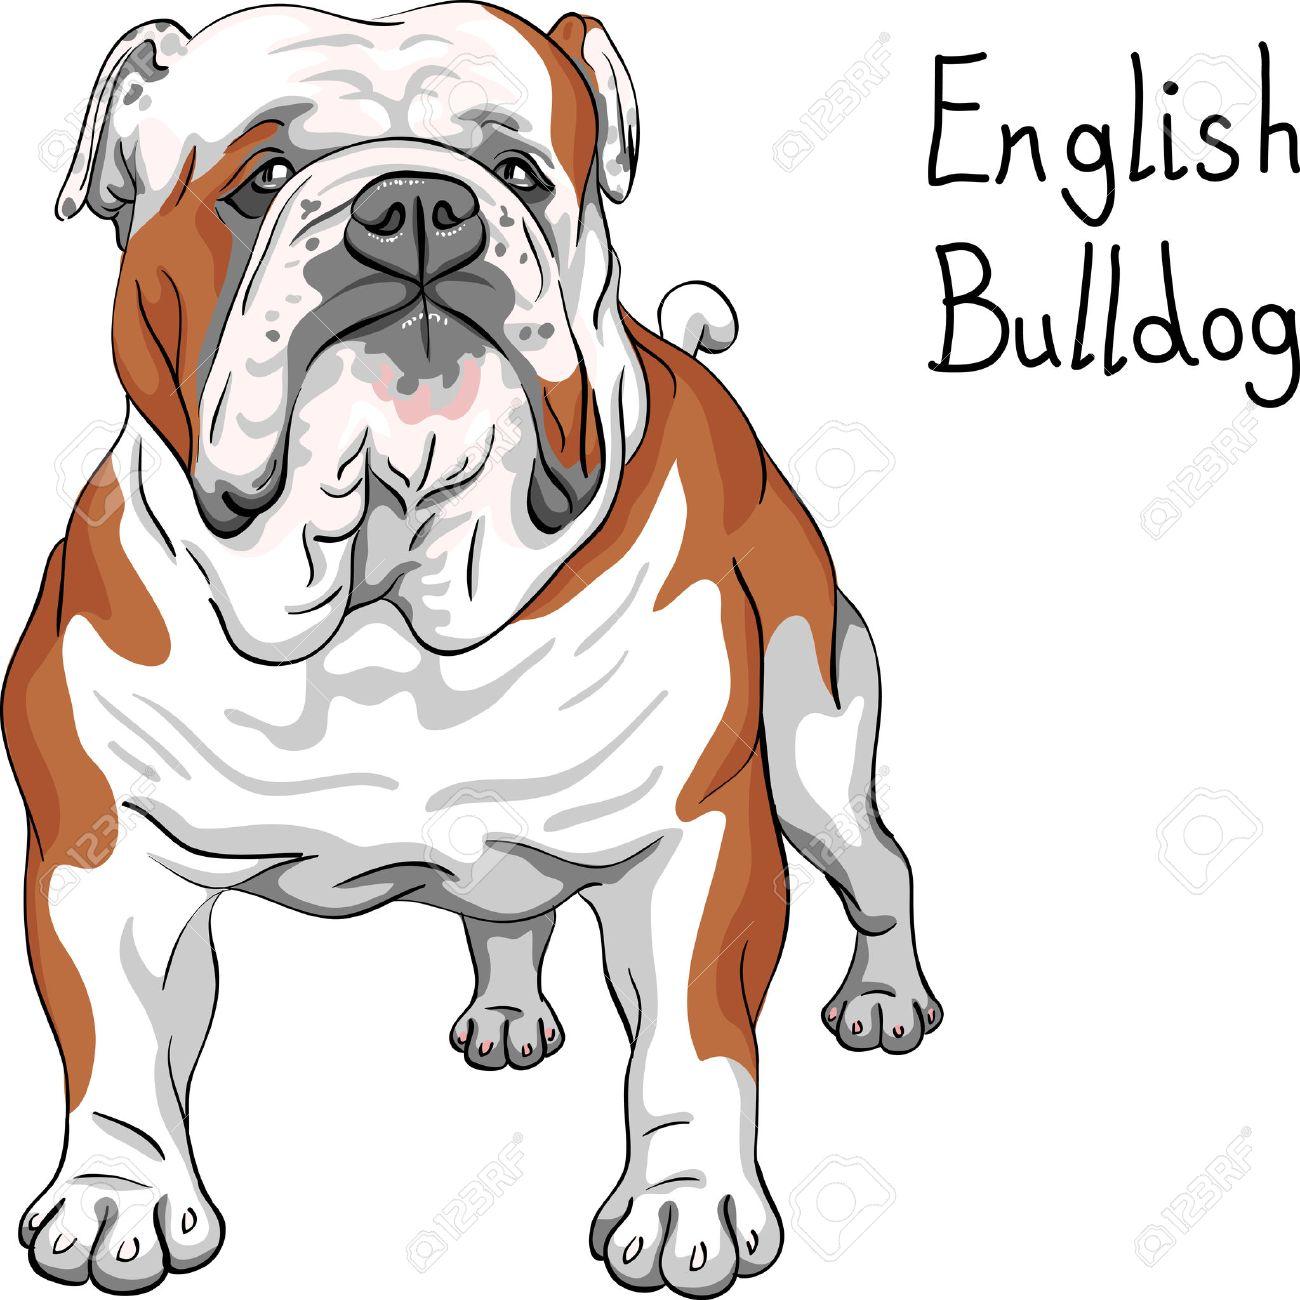 Bulldog graphics pictures